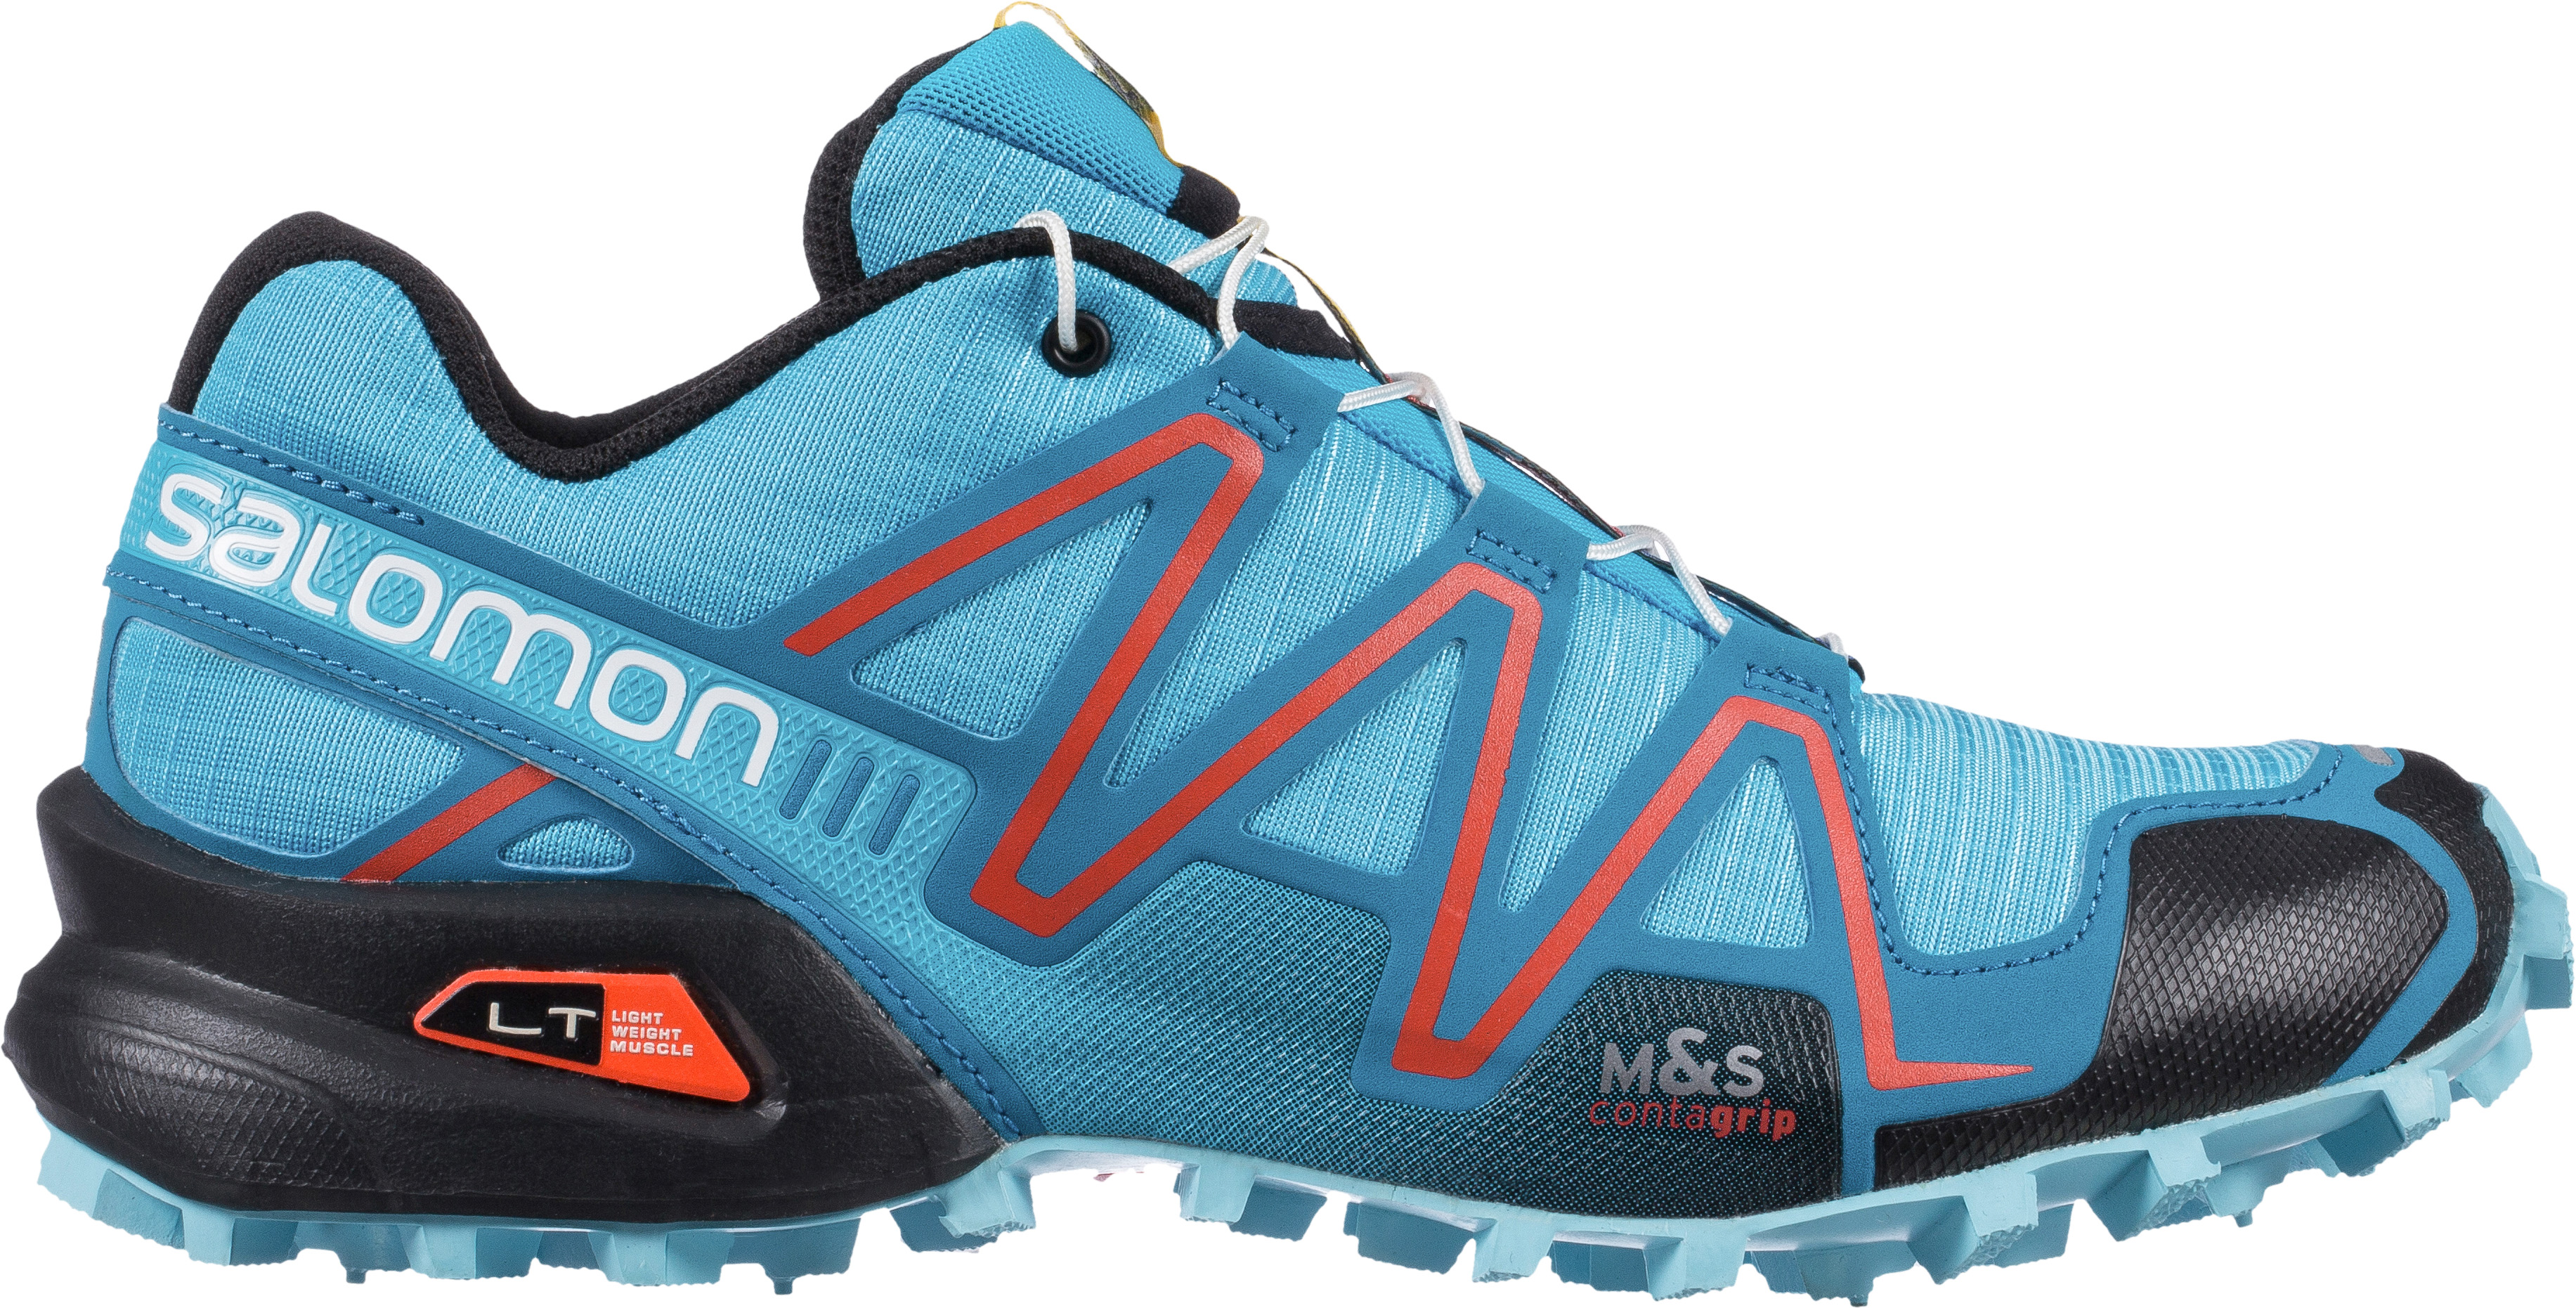 Salomon Mens Grey Dark Blue Running Shoes Kalalau Light The 3eaaG